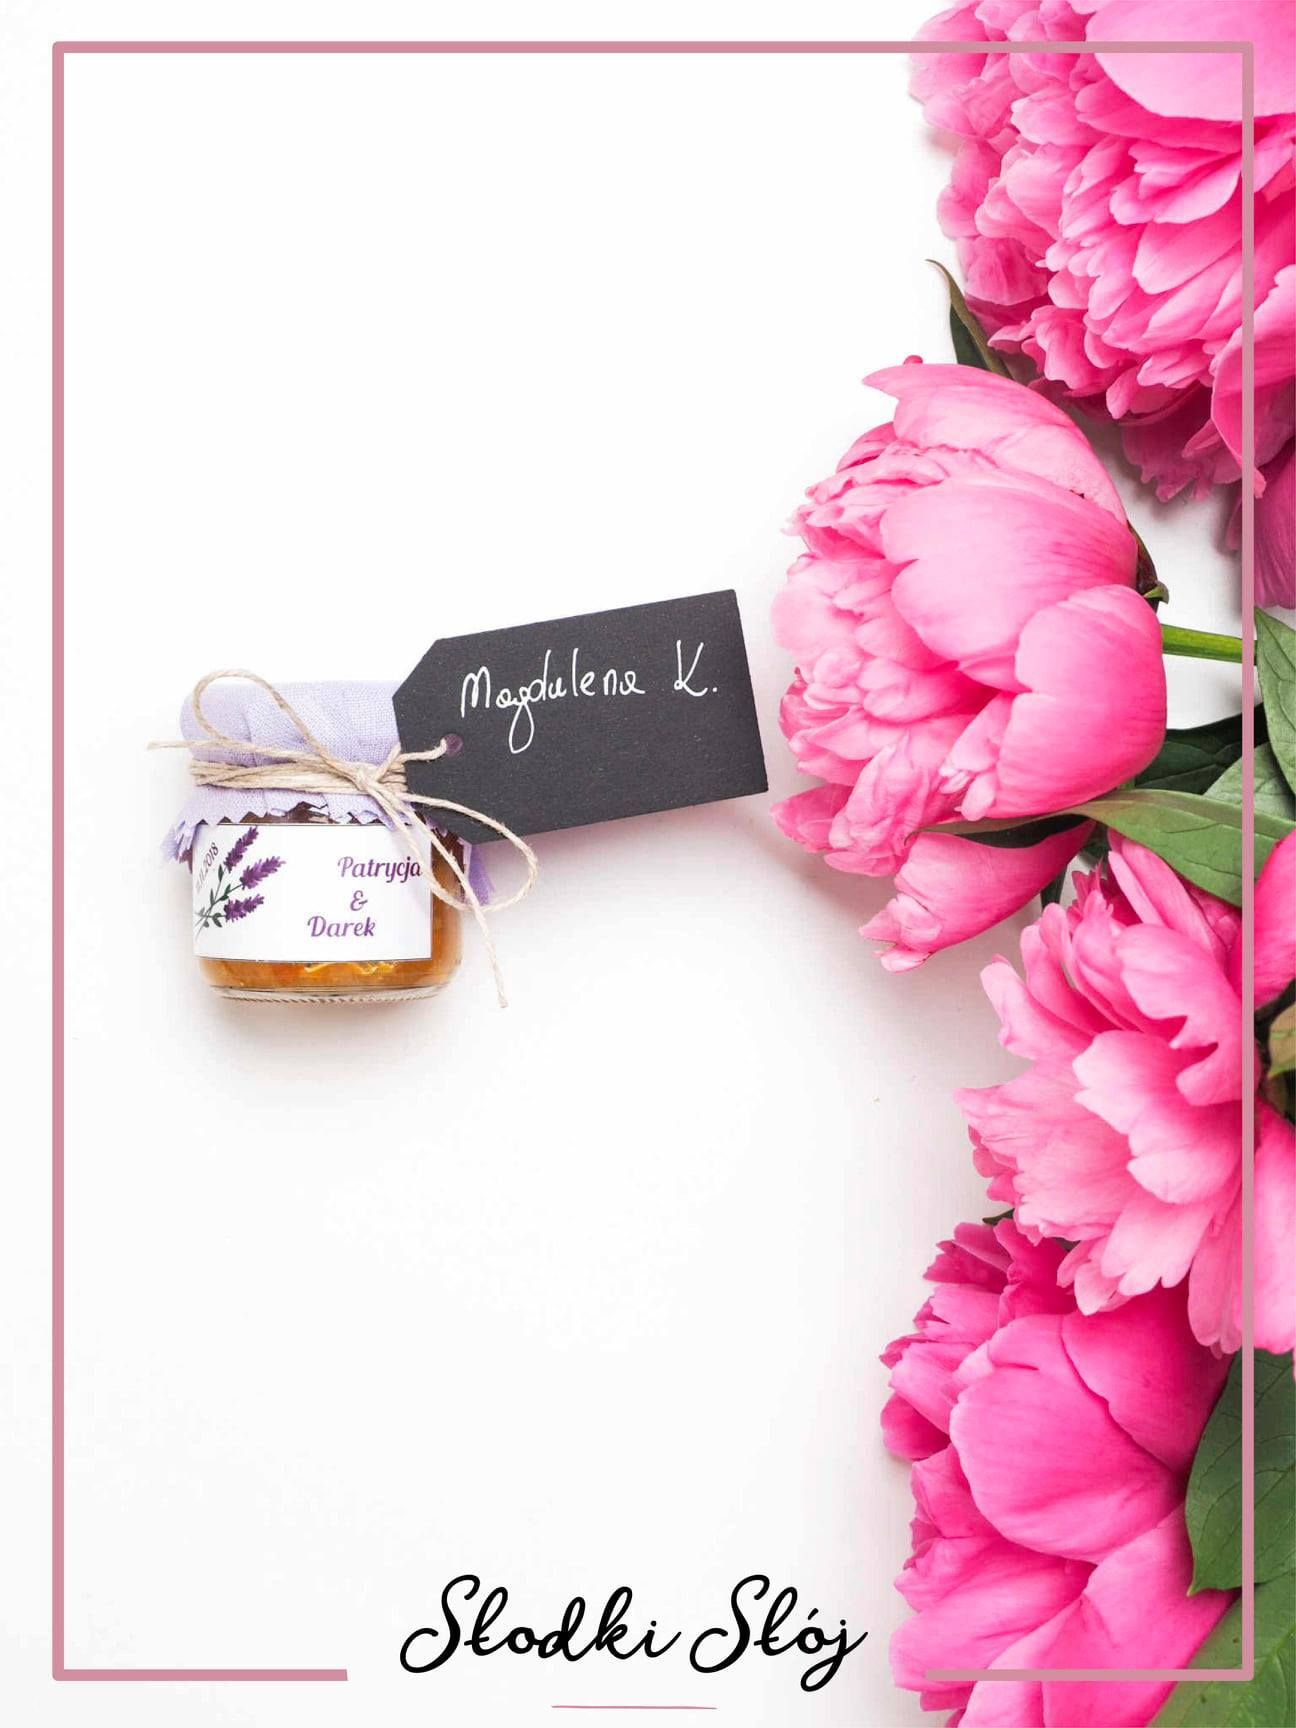 Letnie Wesele Podziekowania Dla Gosci Place Card Holders Stud Earrings Card Holder